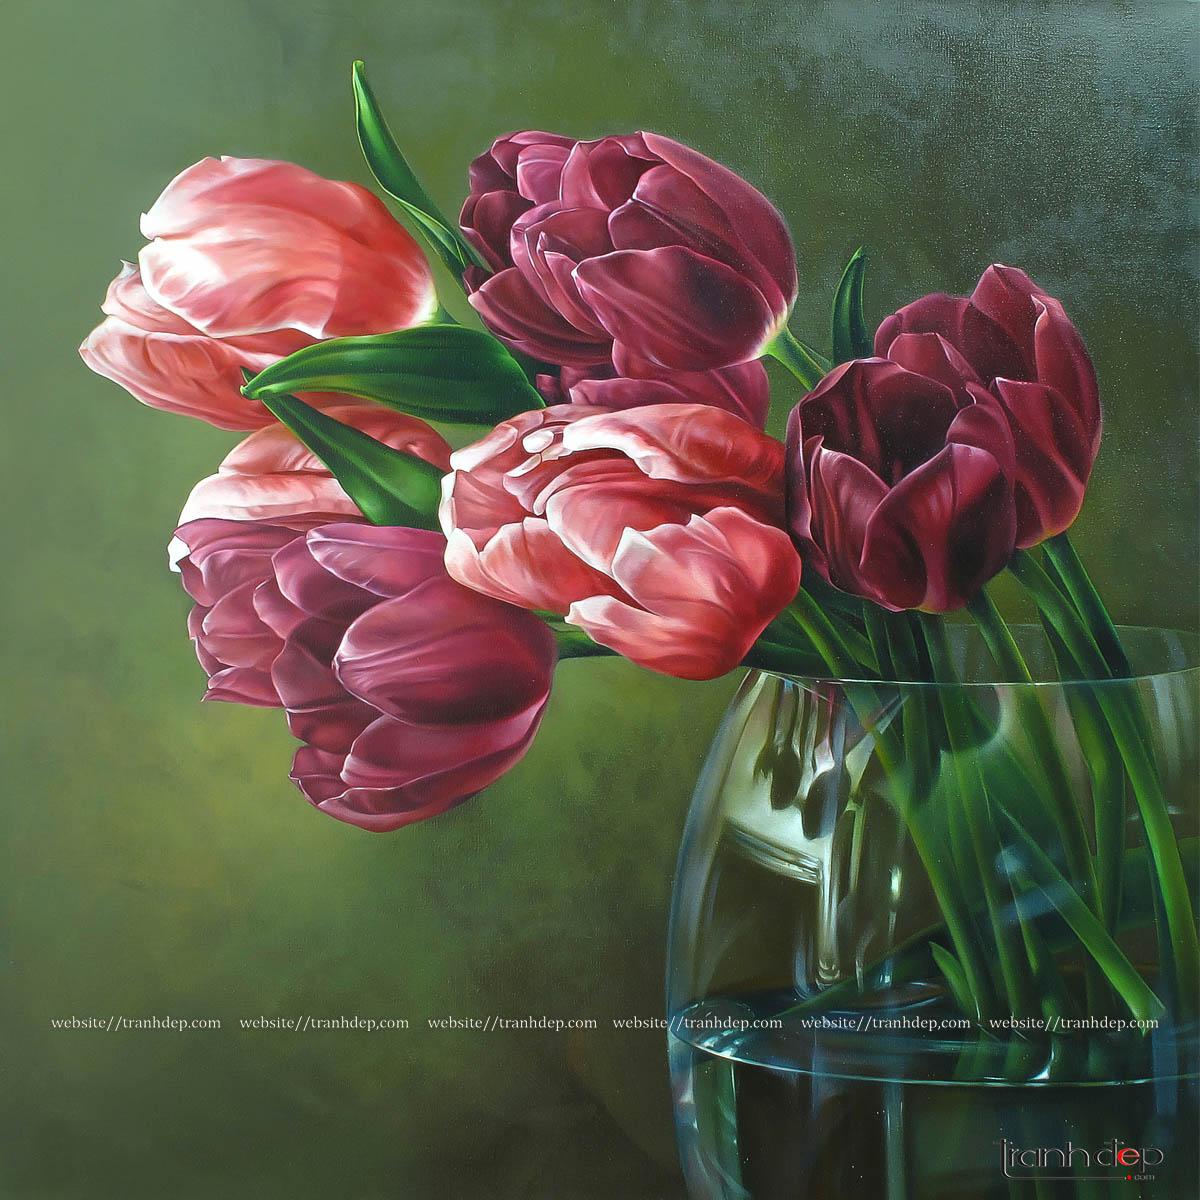 Tổng quan bức tranh hoa tulip